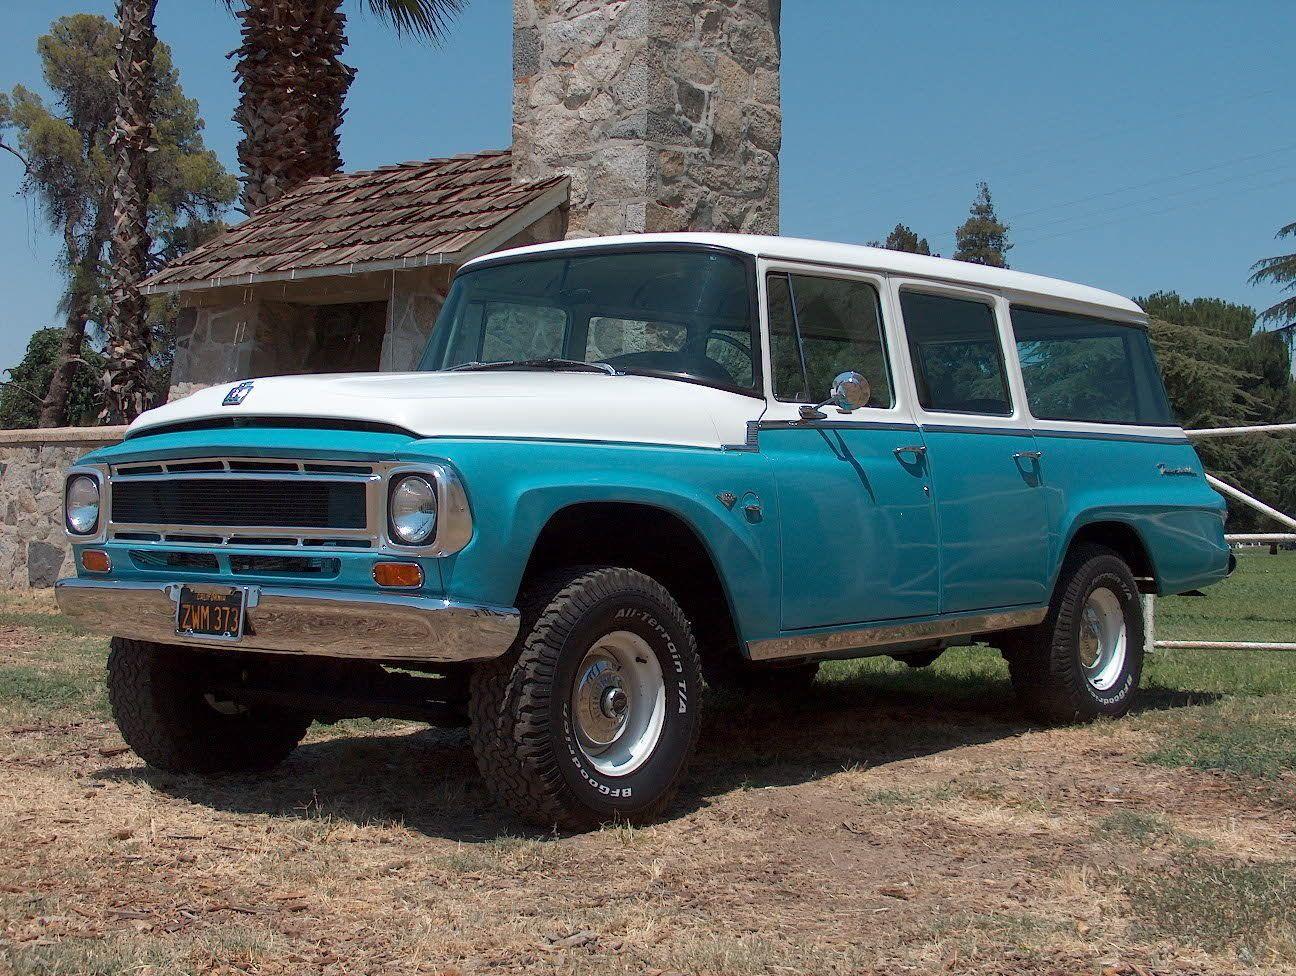 Us 3 550 00 Used In Ebay Motors Cars Trucks International Harvester Gmc Classic Jeeps Chevrolet Suburban